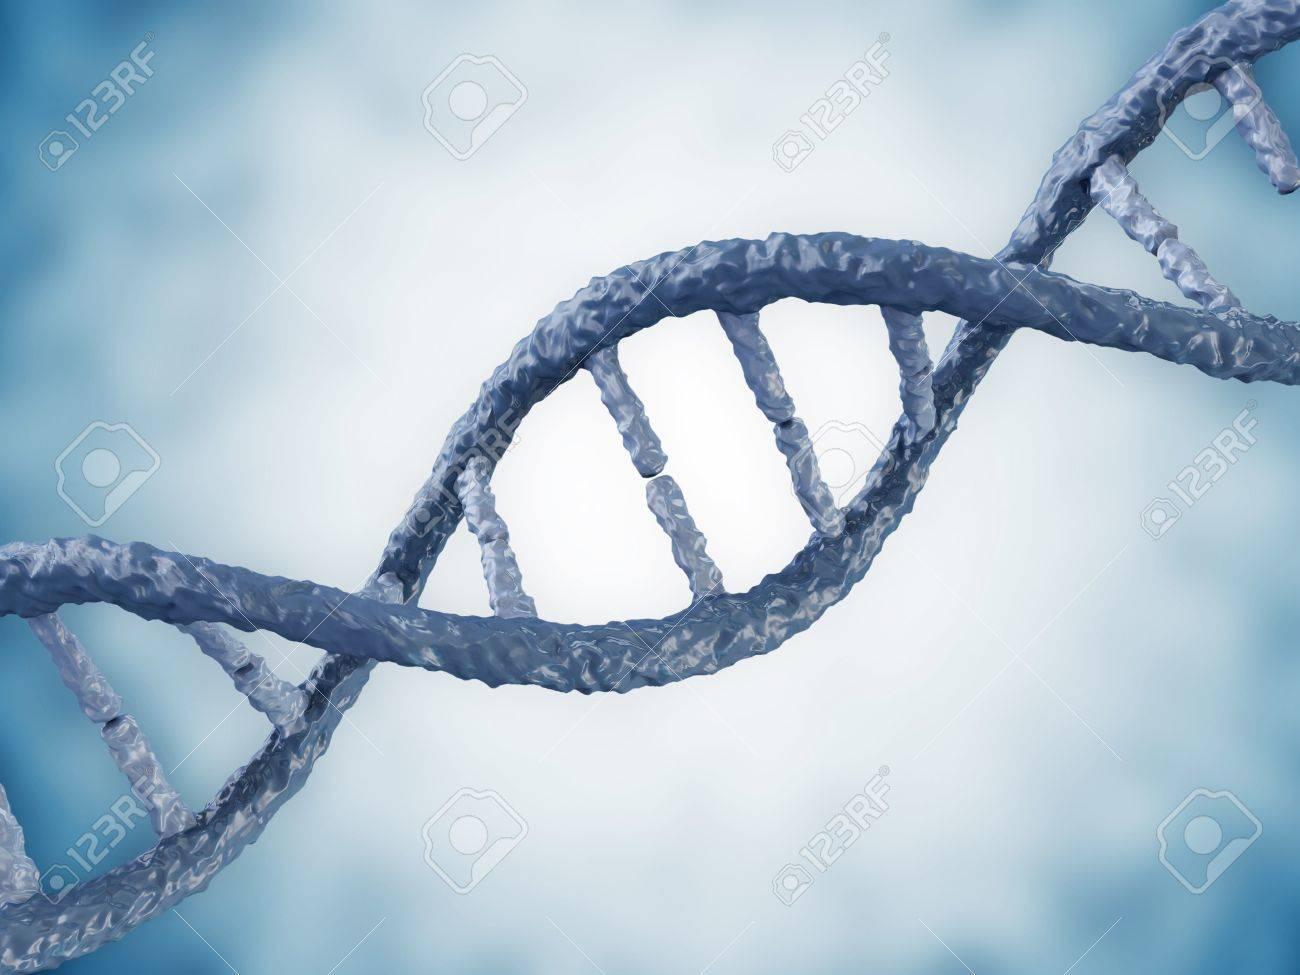 Digital illustration of a DNA on blue background Stock Photo - 20082132